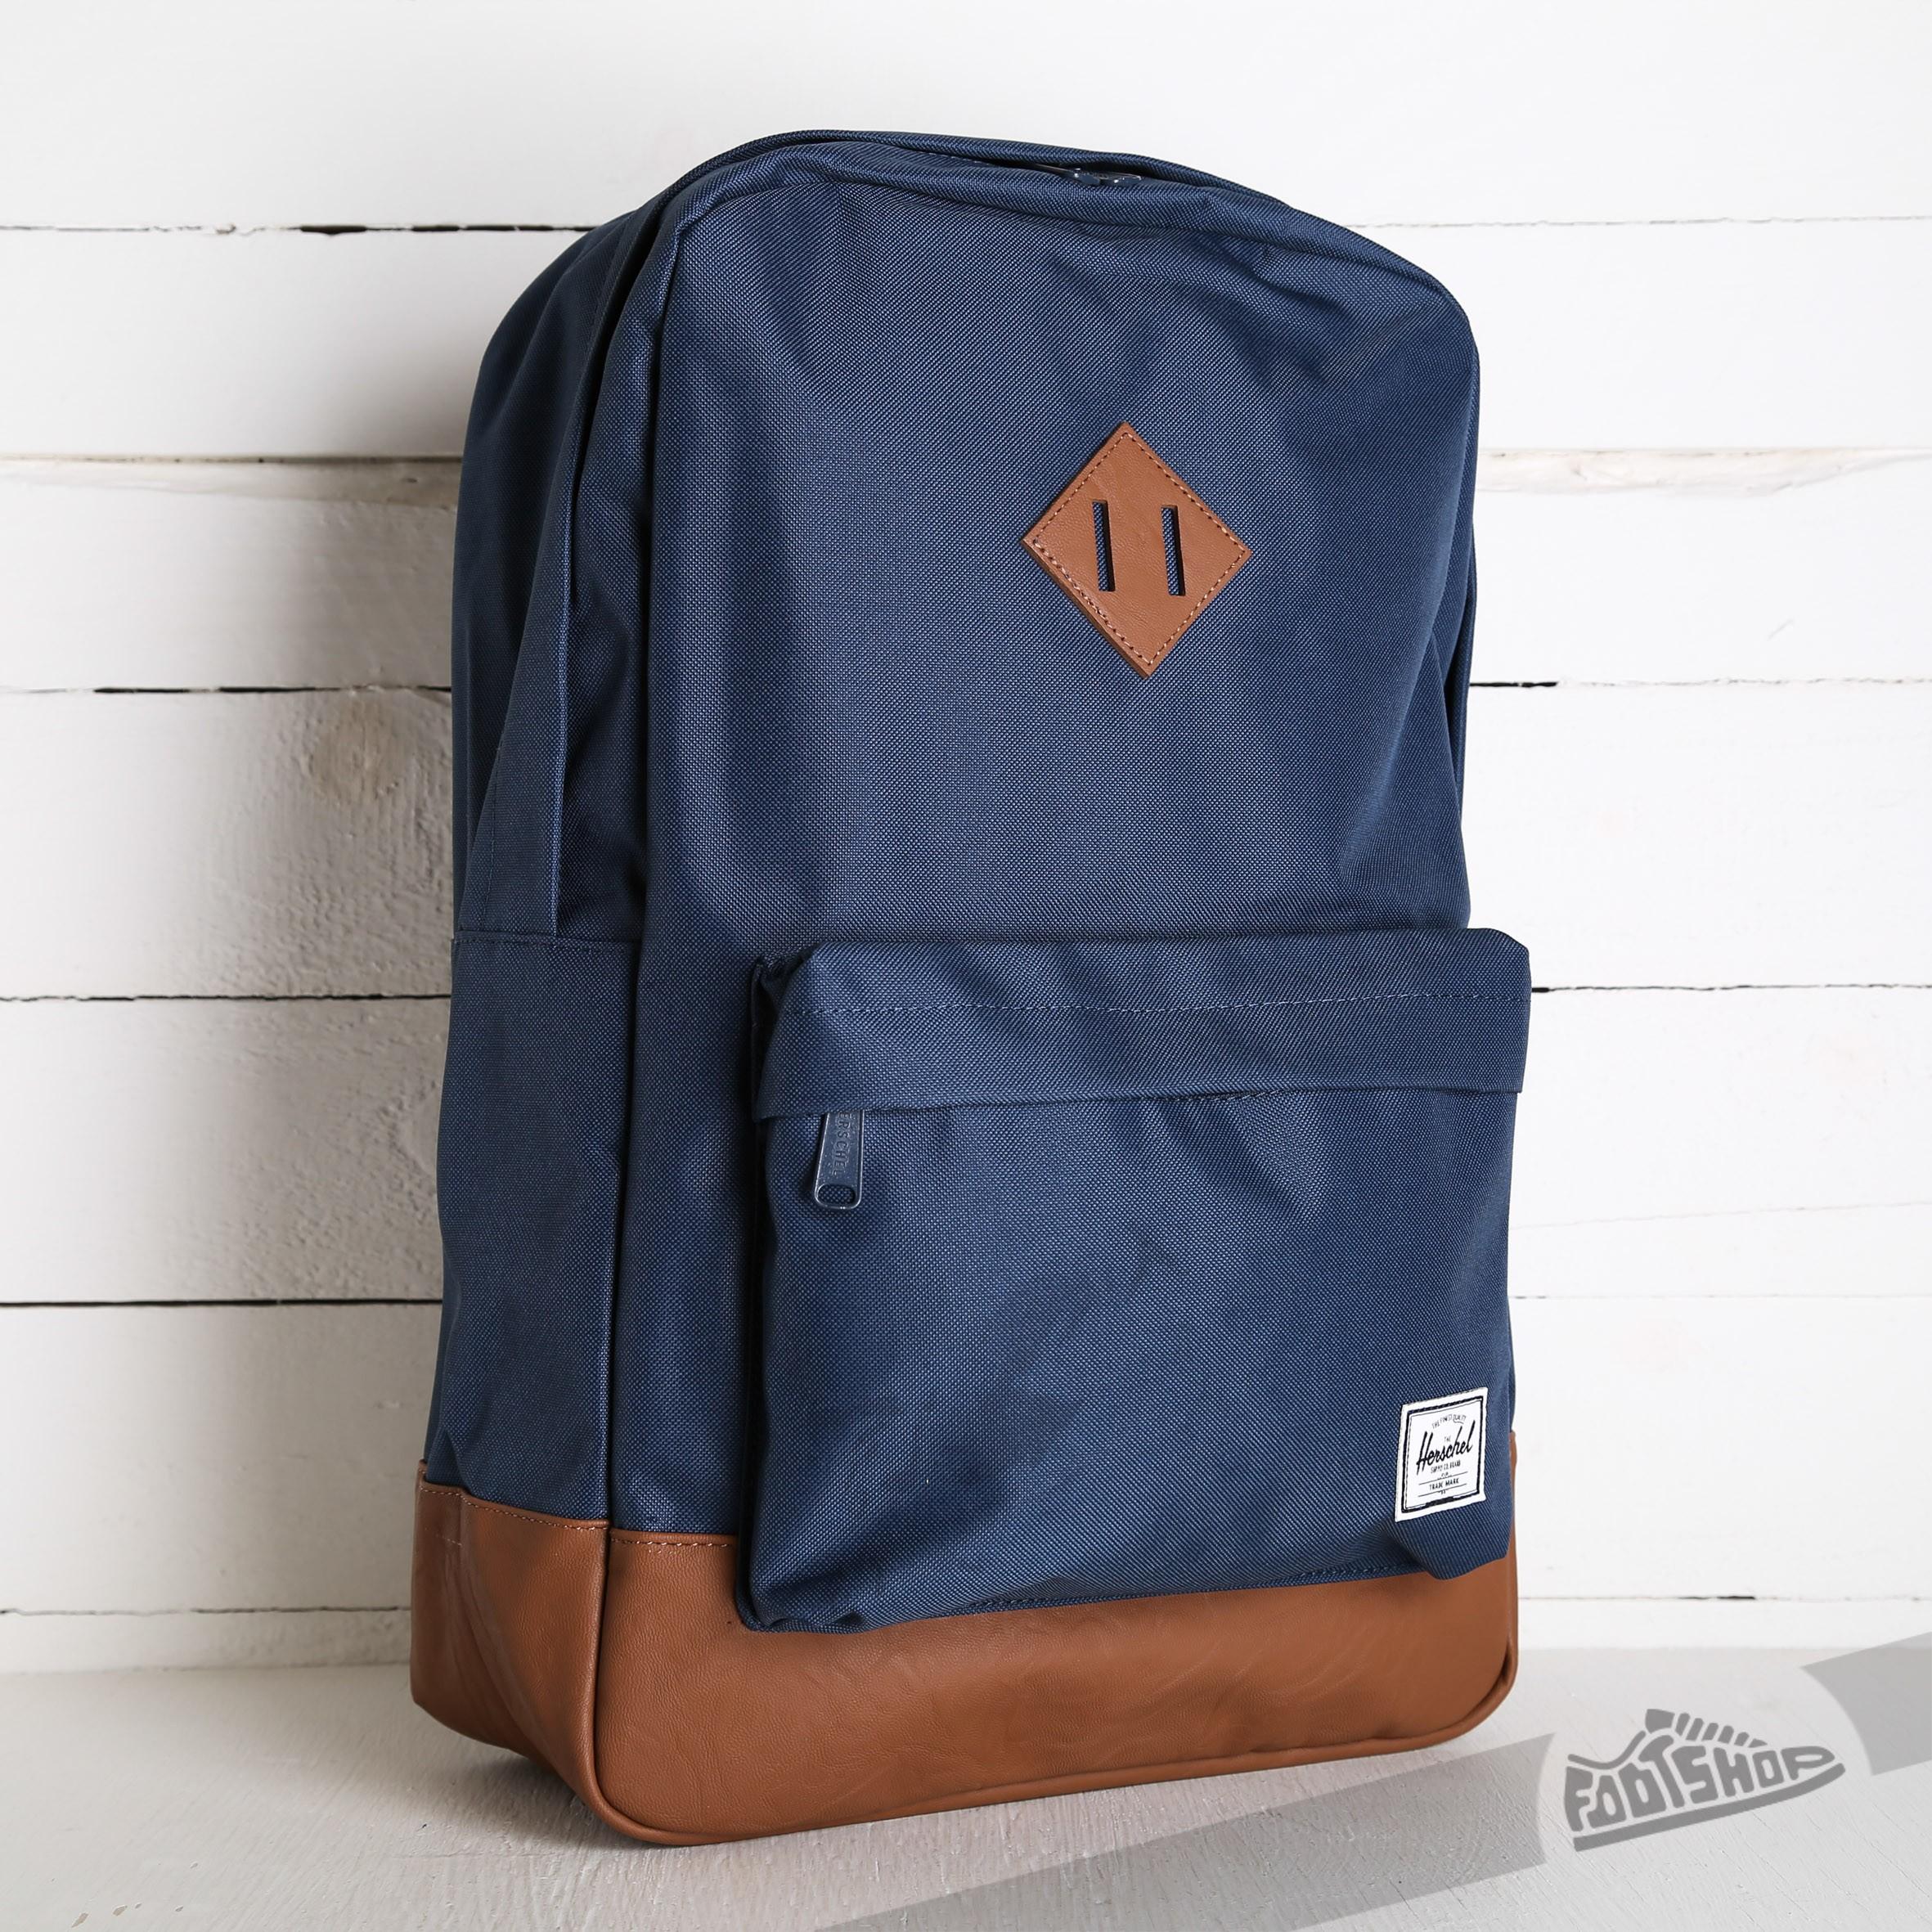 def37a483ad Herschel Supply Co. Heritage Backpack Navy Tan